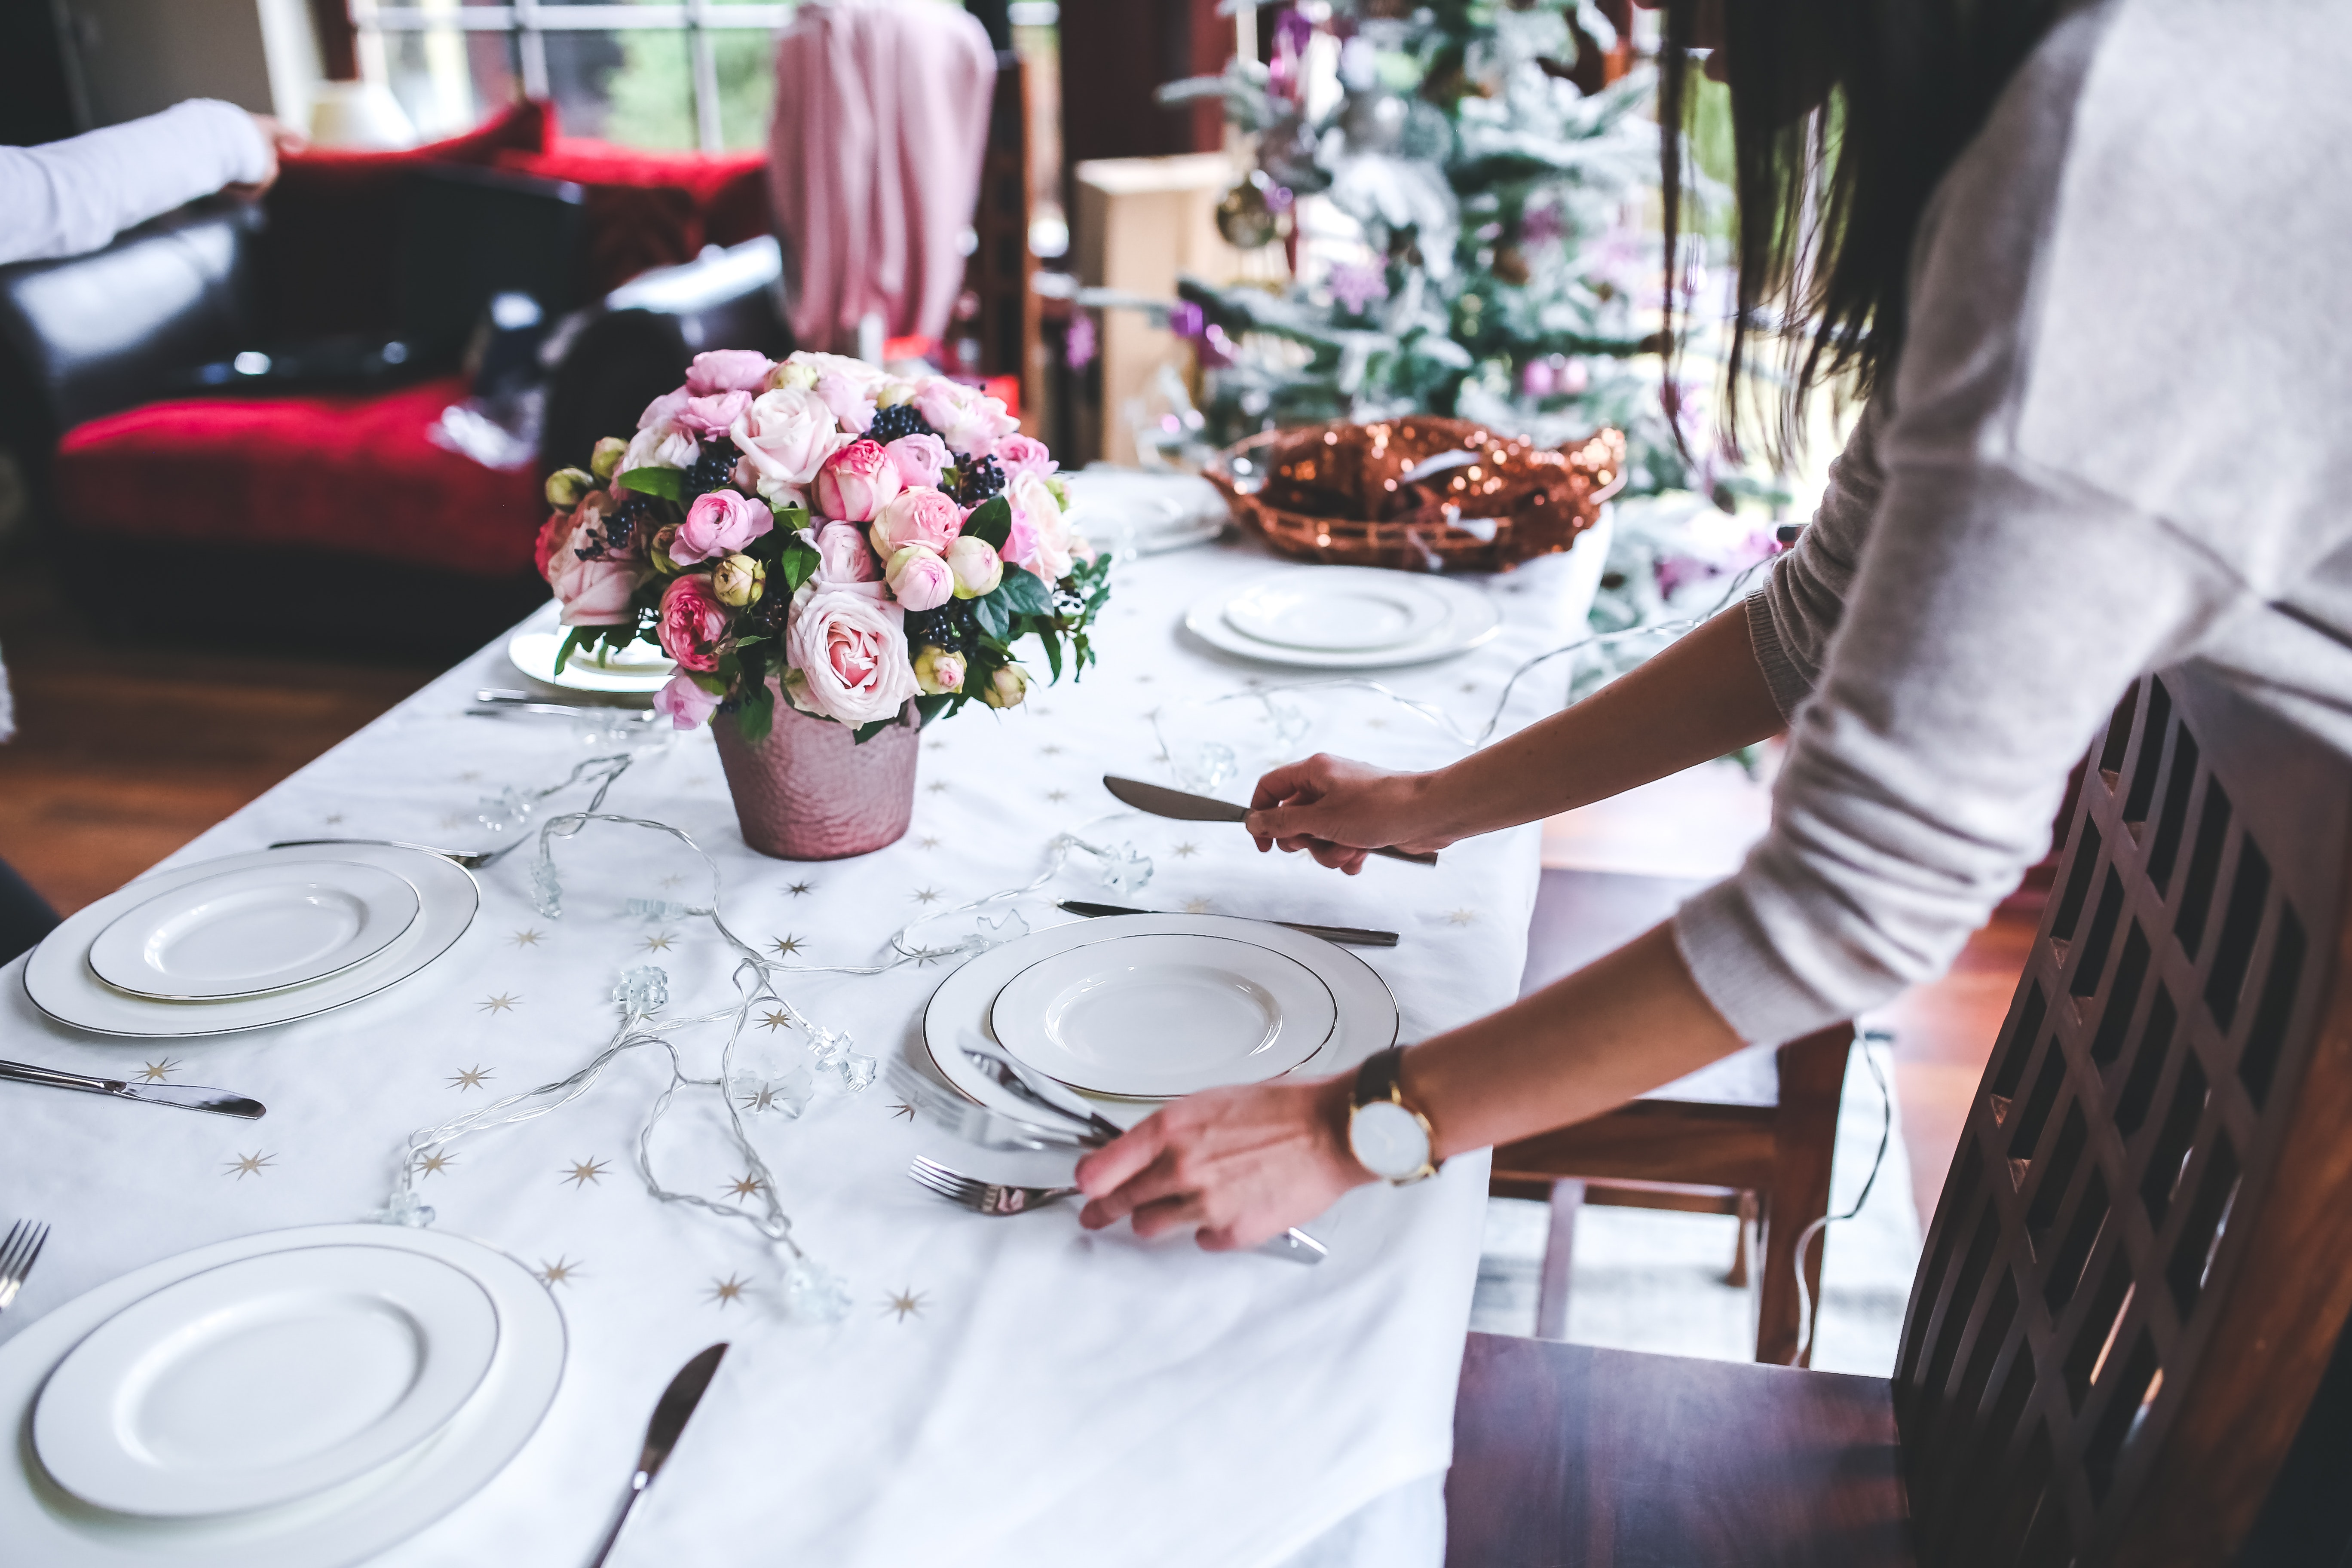 Woman Preparing Christmas Table, Adult, Interior, Woman, Wedding, HQ Photo